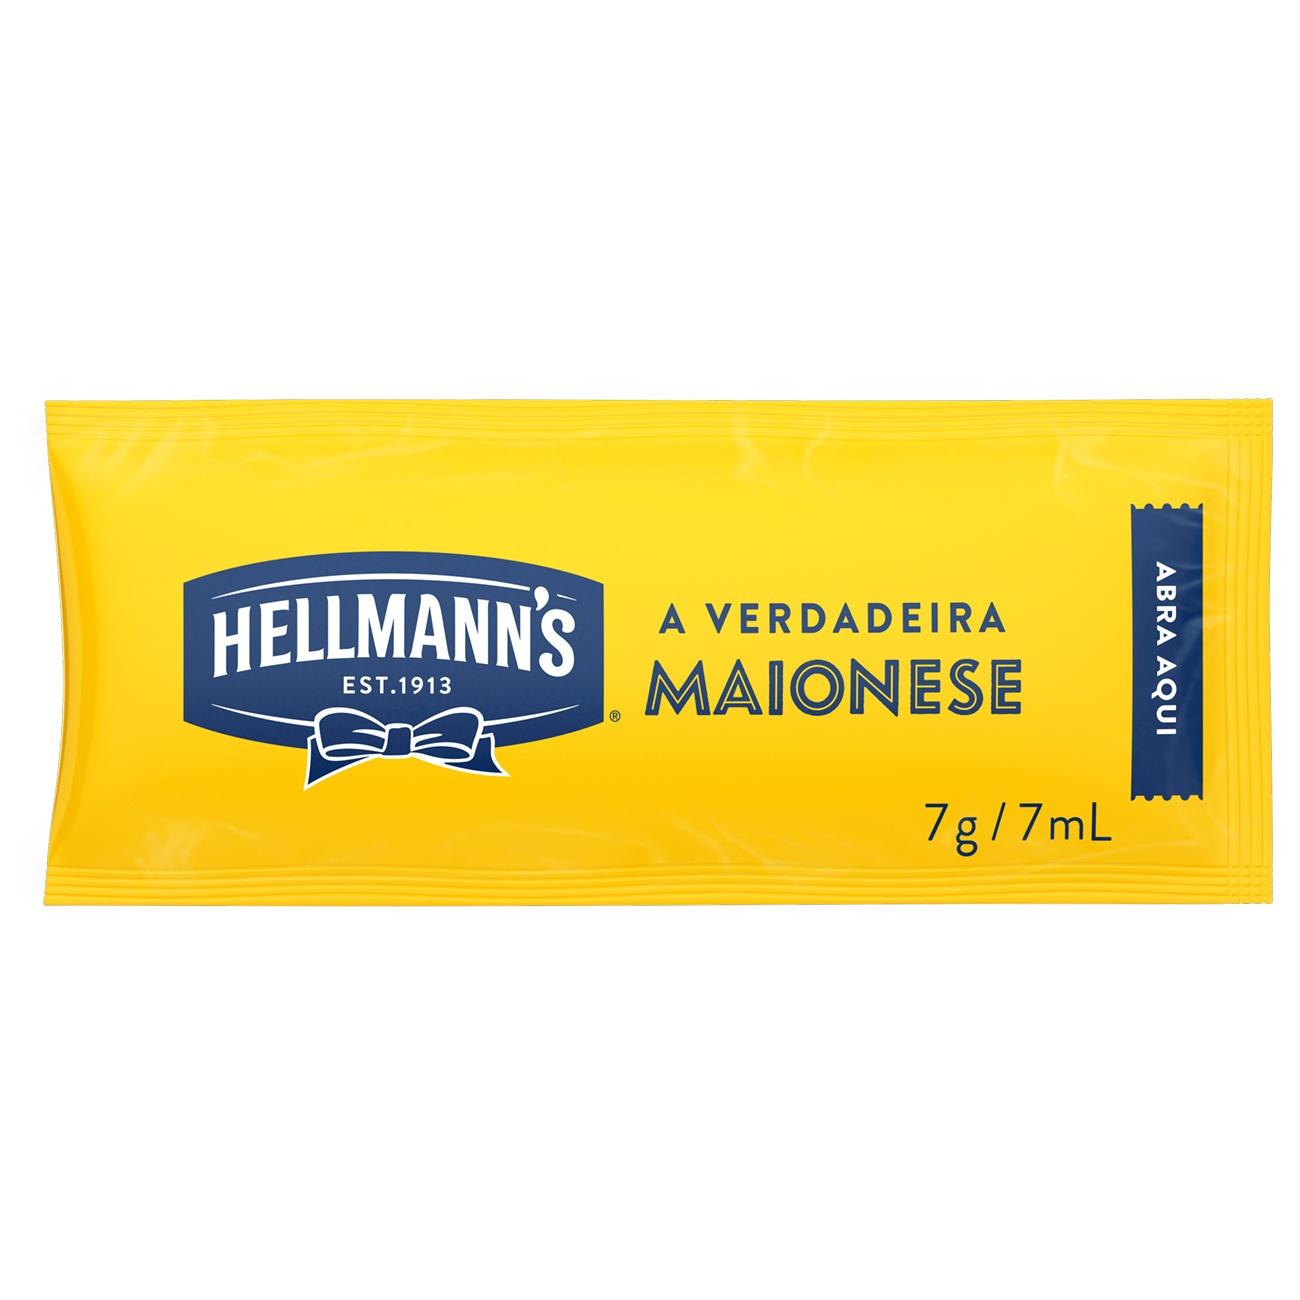 Maionese Sache Hellmann's 7g l 168 Unidades